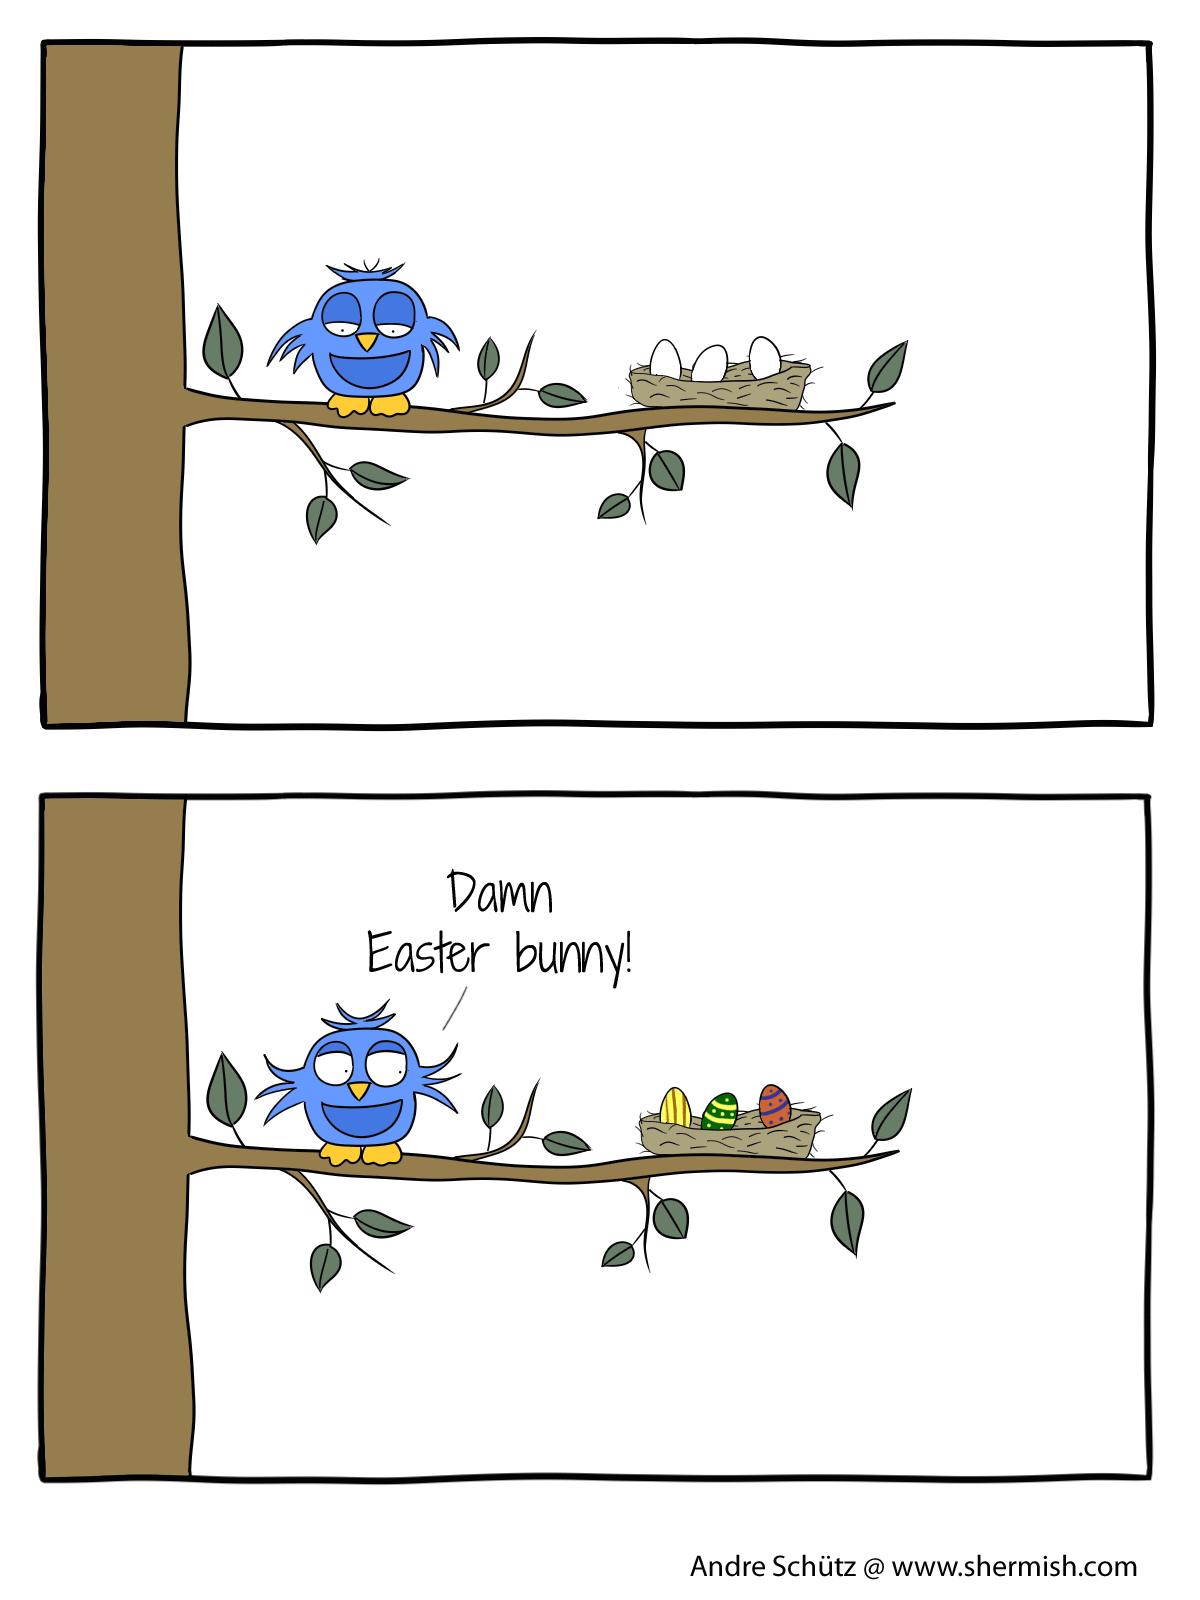 Birds: Protect your eggs - Damn Easter bunny